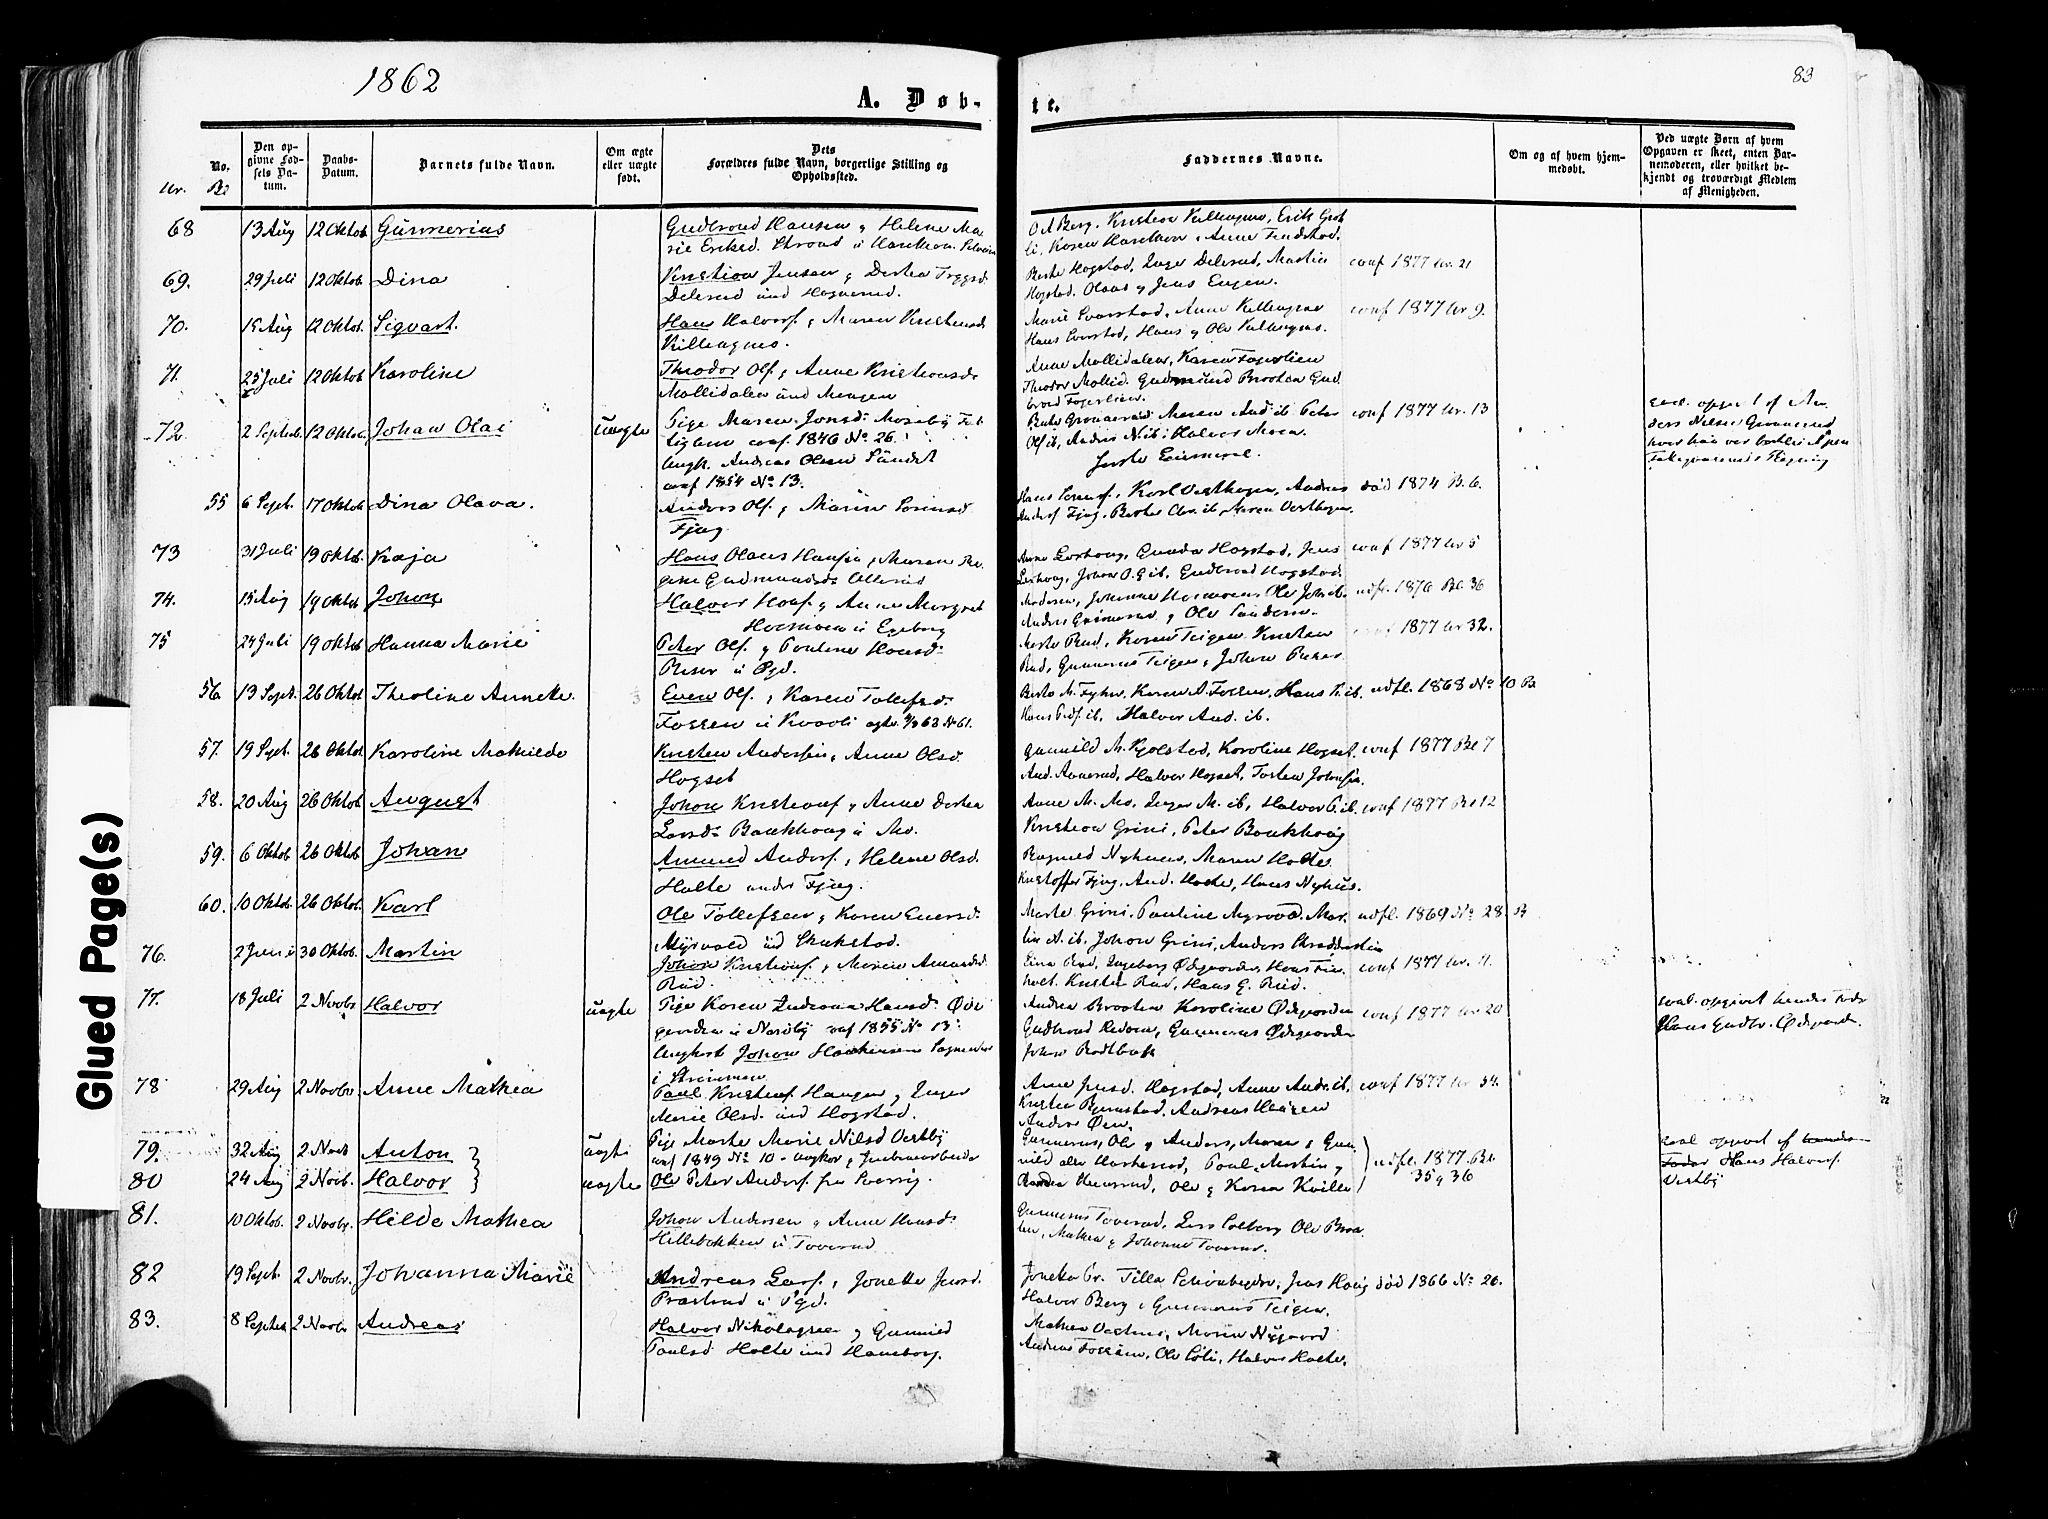 SAO, Aurskog prestekontor Kirkebøker, F/Fa/L0007: Ministerialbok nr. I 7, 1854-1877, s. 83